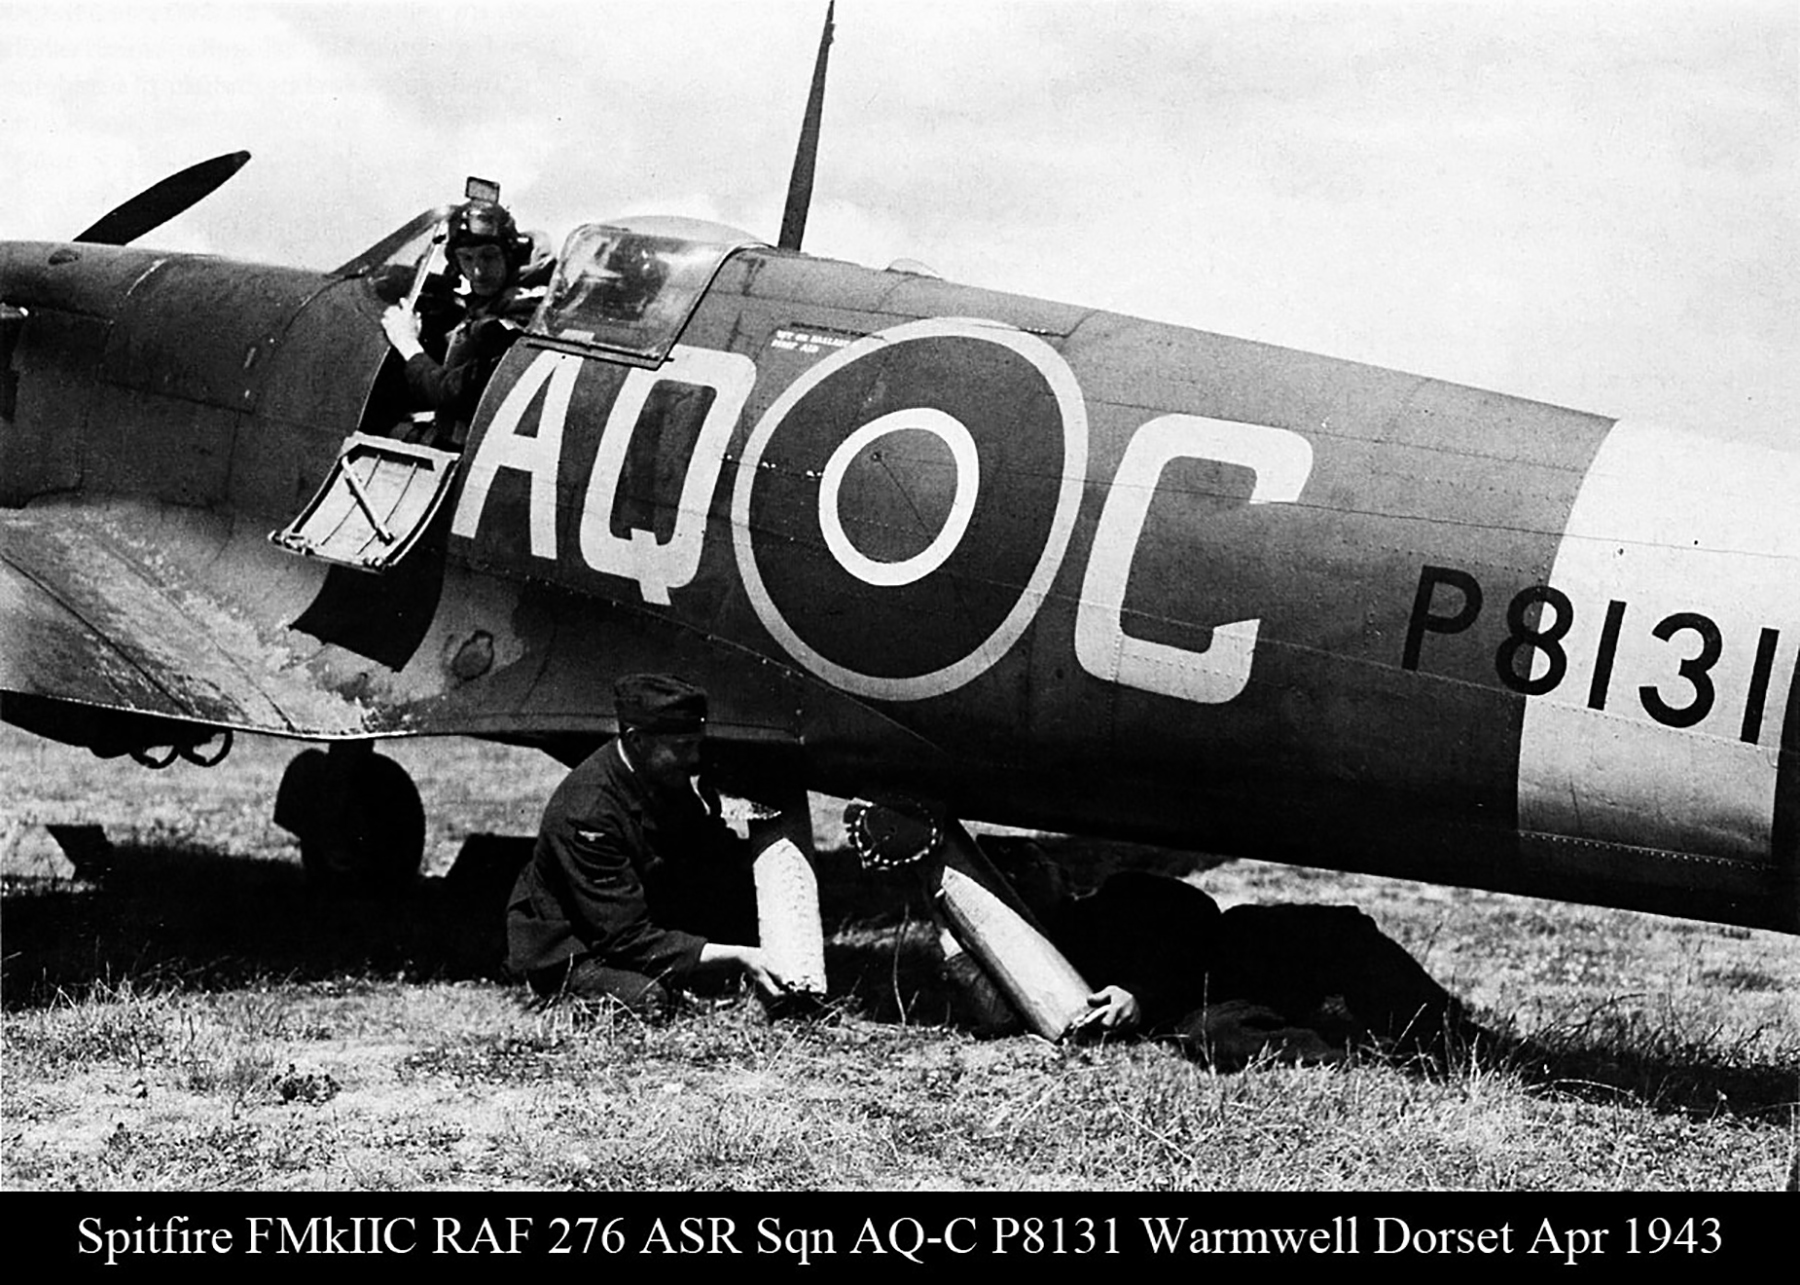 Spitfire FIIc RAF 276Sqn ASR AQC P8131 Warmwell Dorset Apr 1943 01